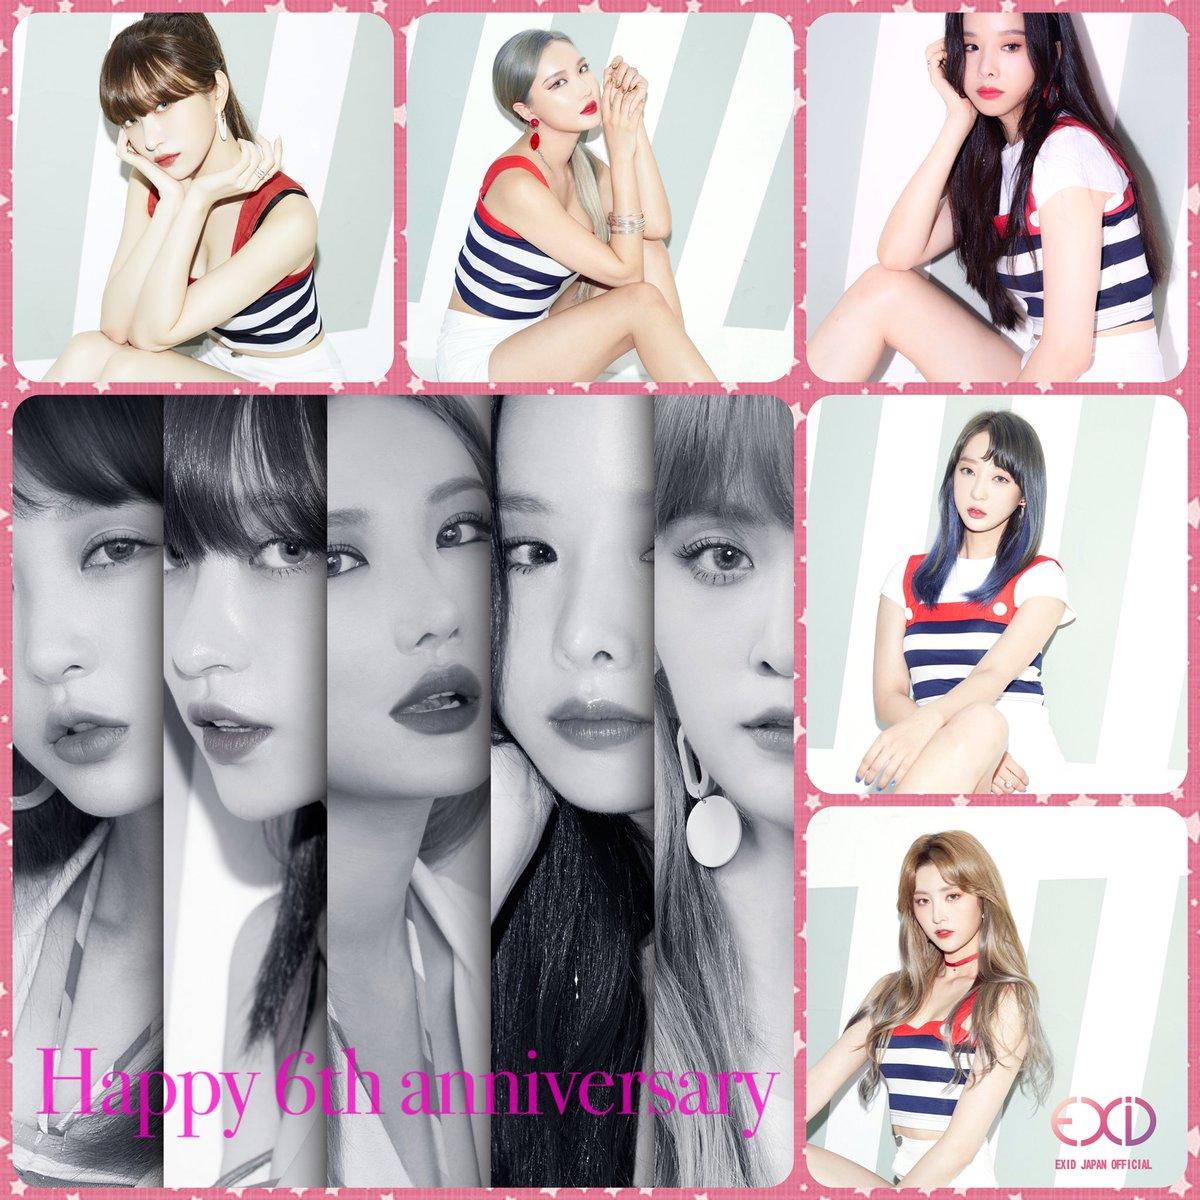 【#EXID 】 Happy 6th Anniversary  Congratulations  #솔지 #LE #하니 #혜린 #정화<br>http://pic.twitter.com/d3ZW9Z2tsK